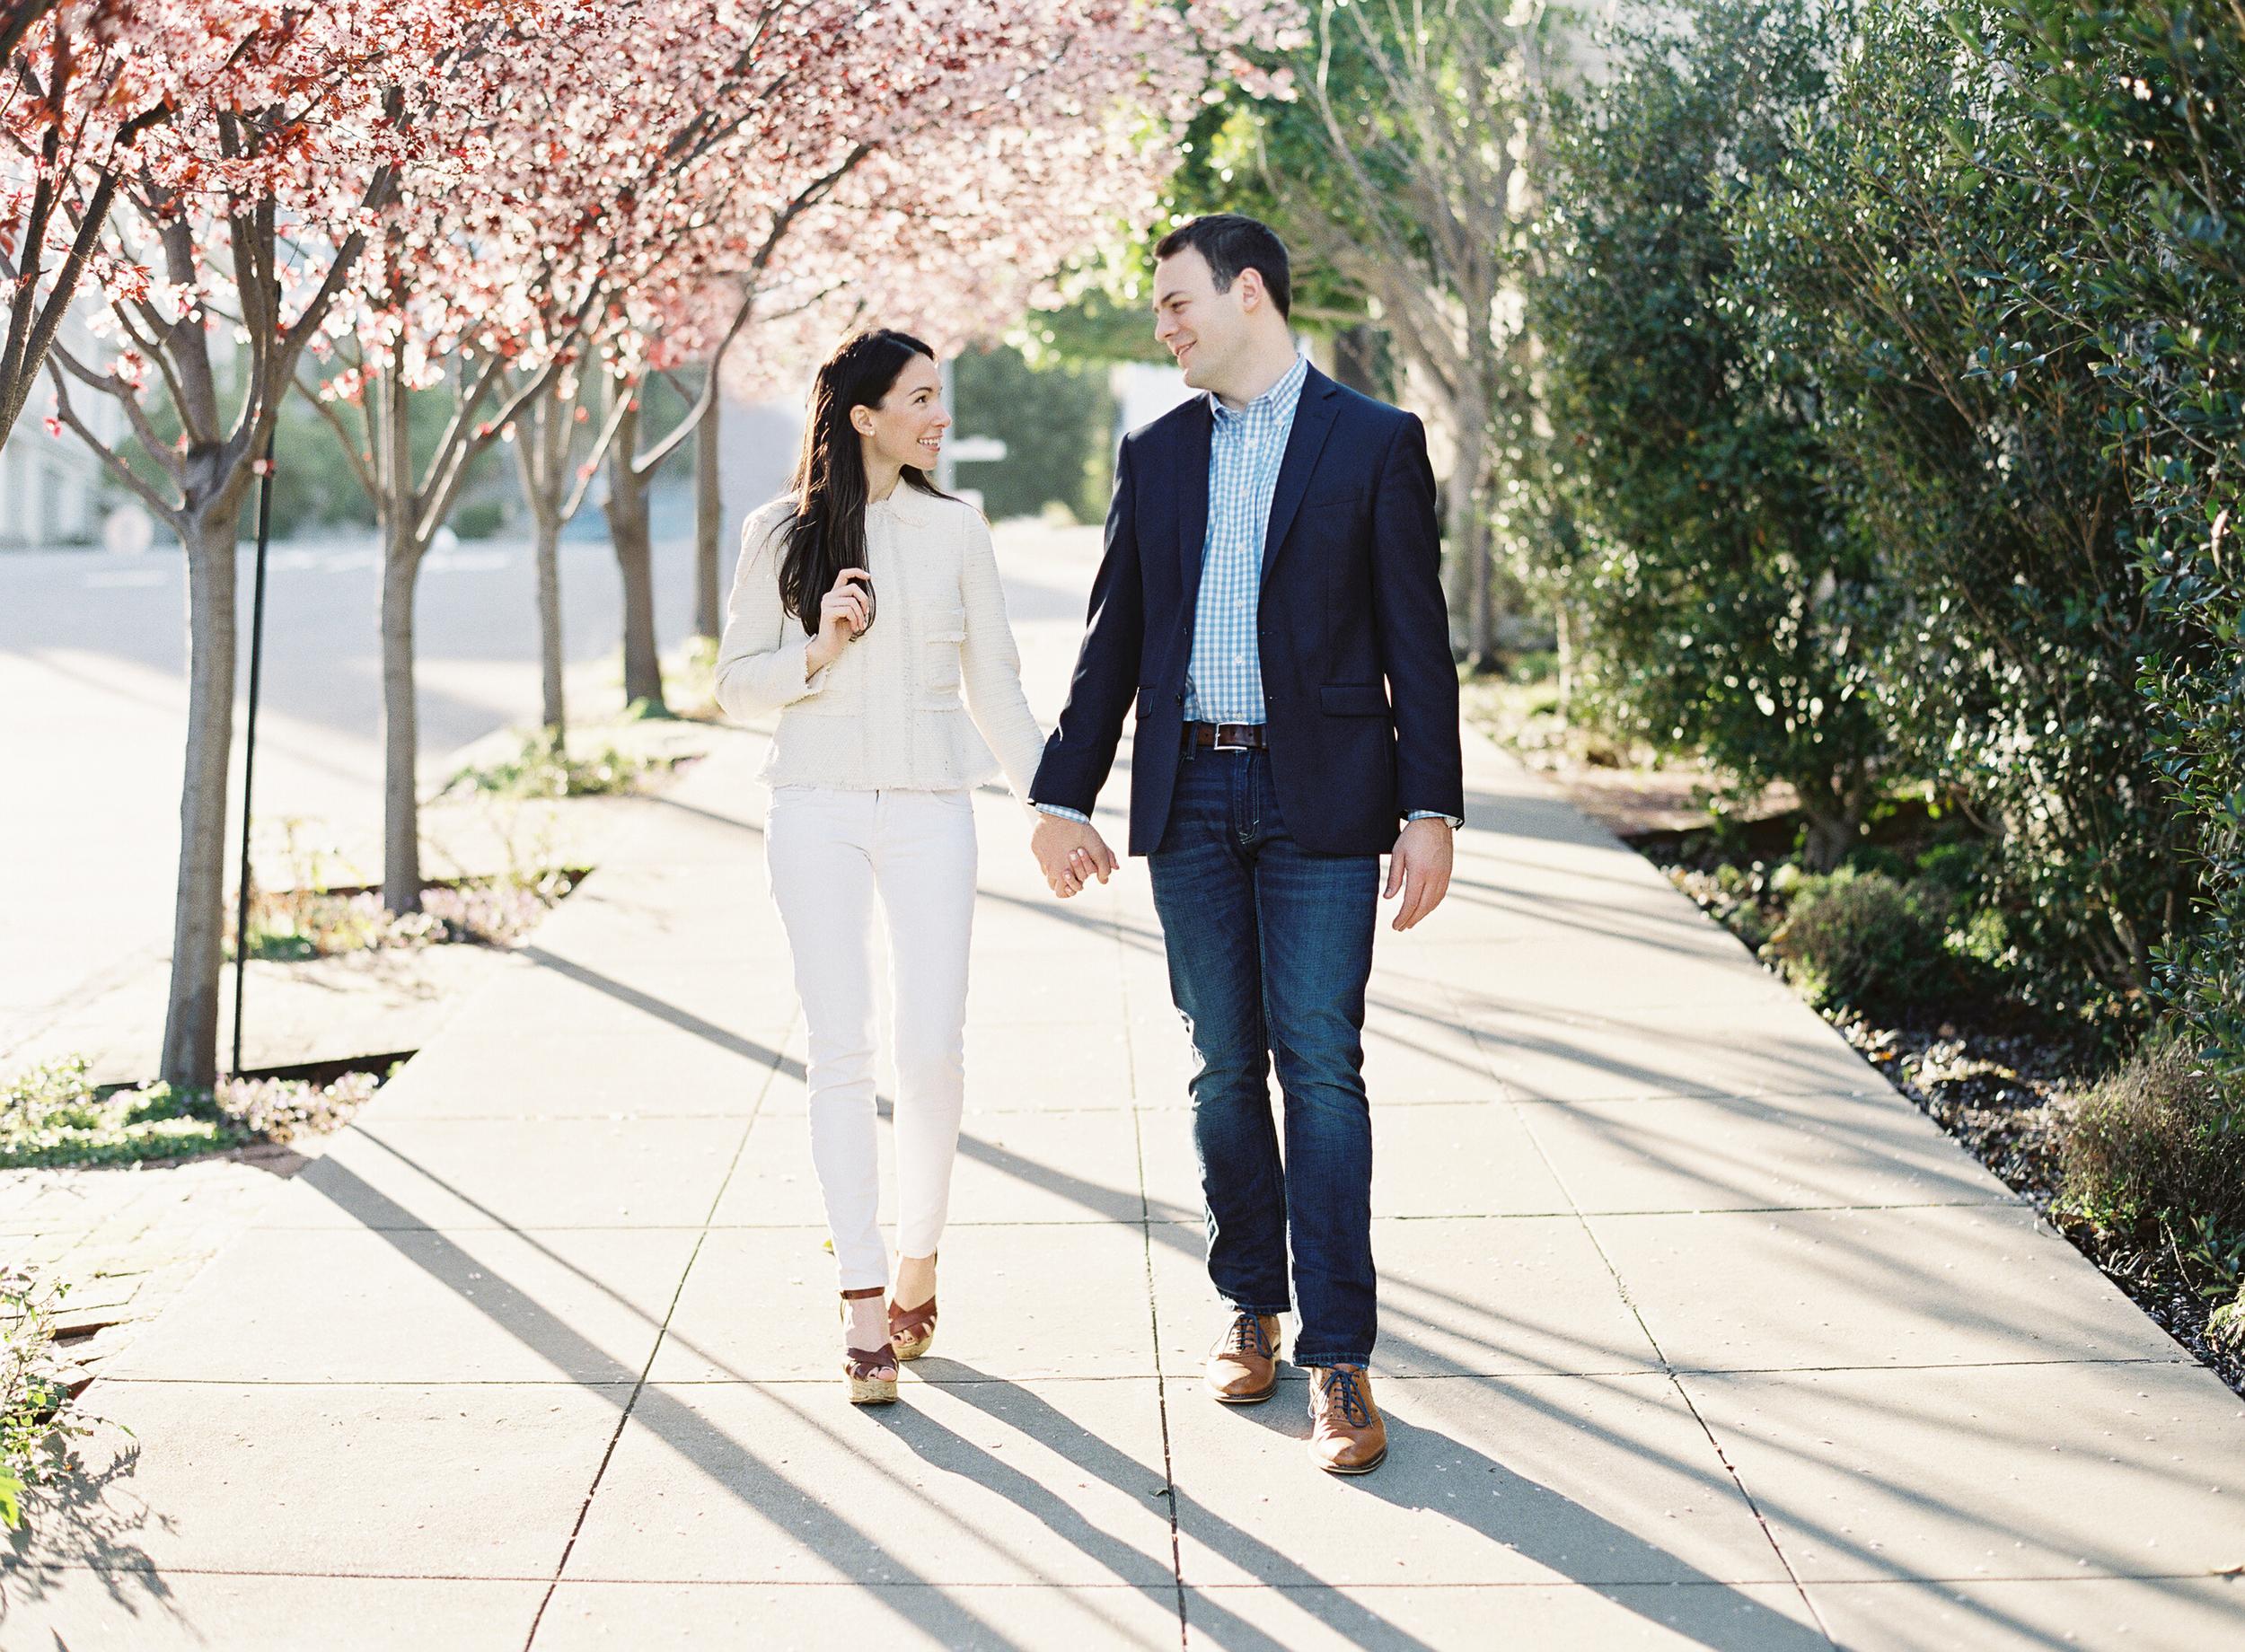 Meghan Mehan Photography - Fine Art Film Wedding Photography - San Francisco - Napa - Sonoma - Big Sur - Chicago - Minneapolis - Milwaukee - Lake Geneva - Door County - Wisconsin034.jpg